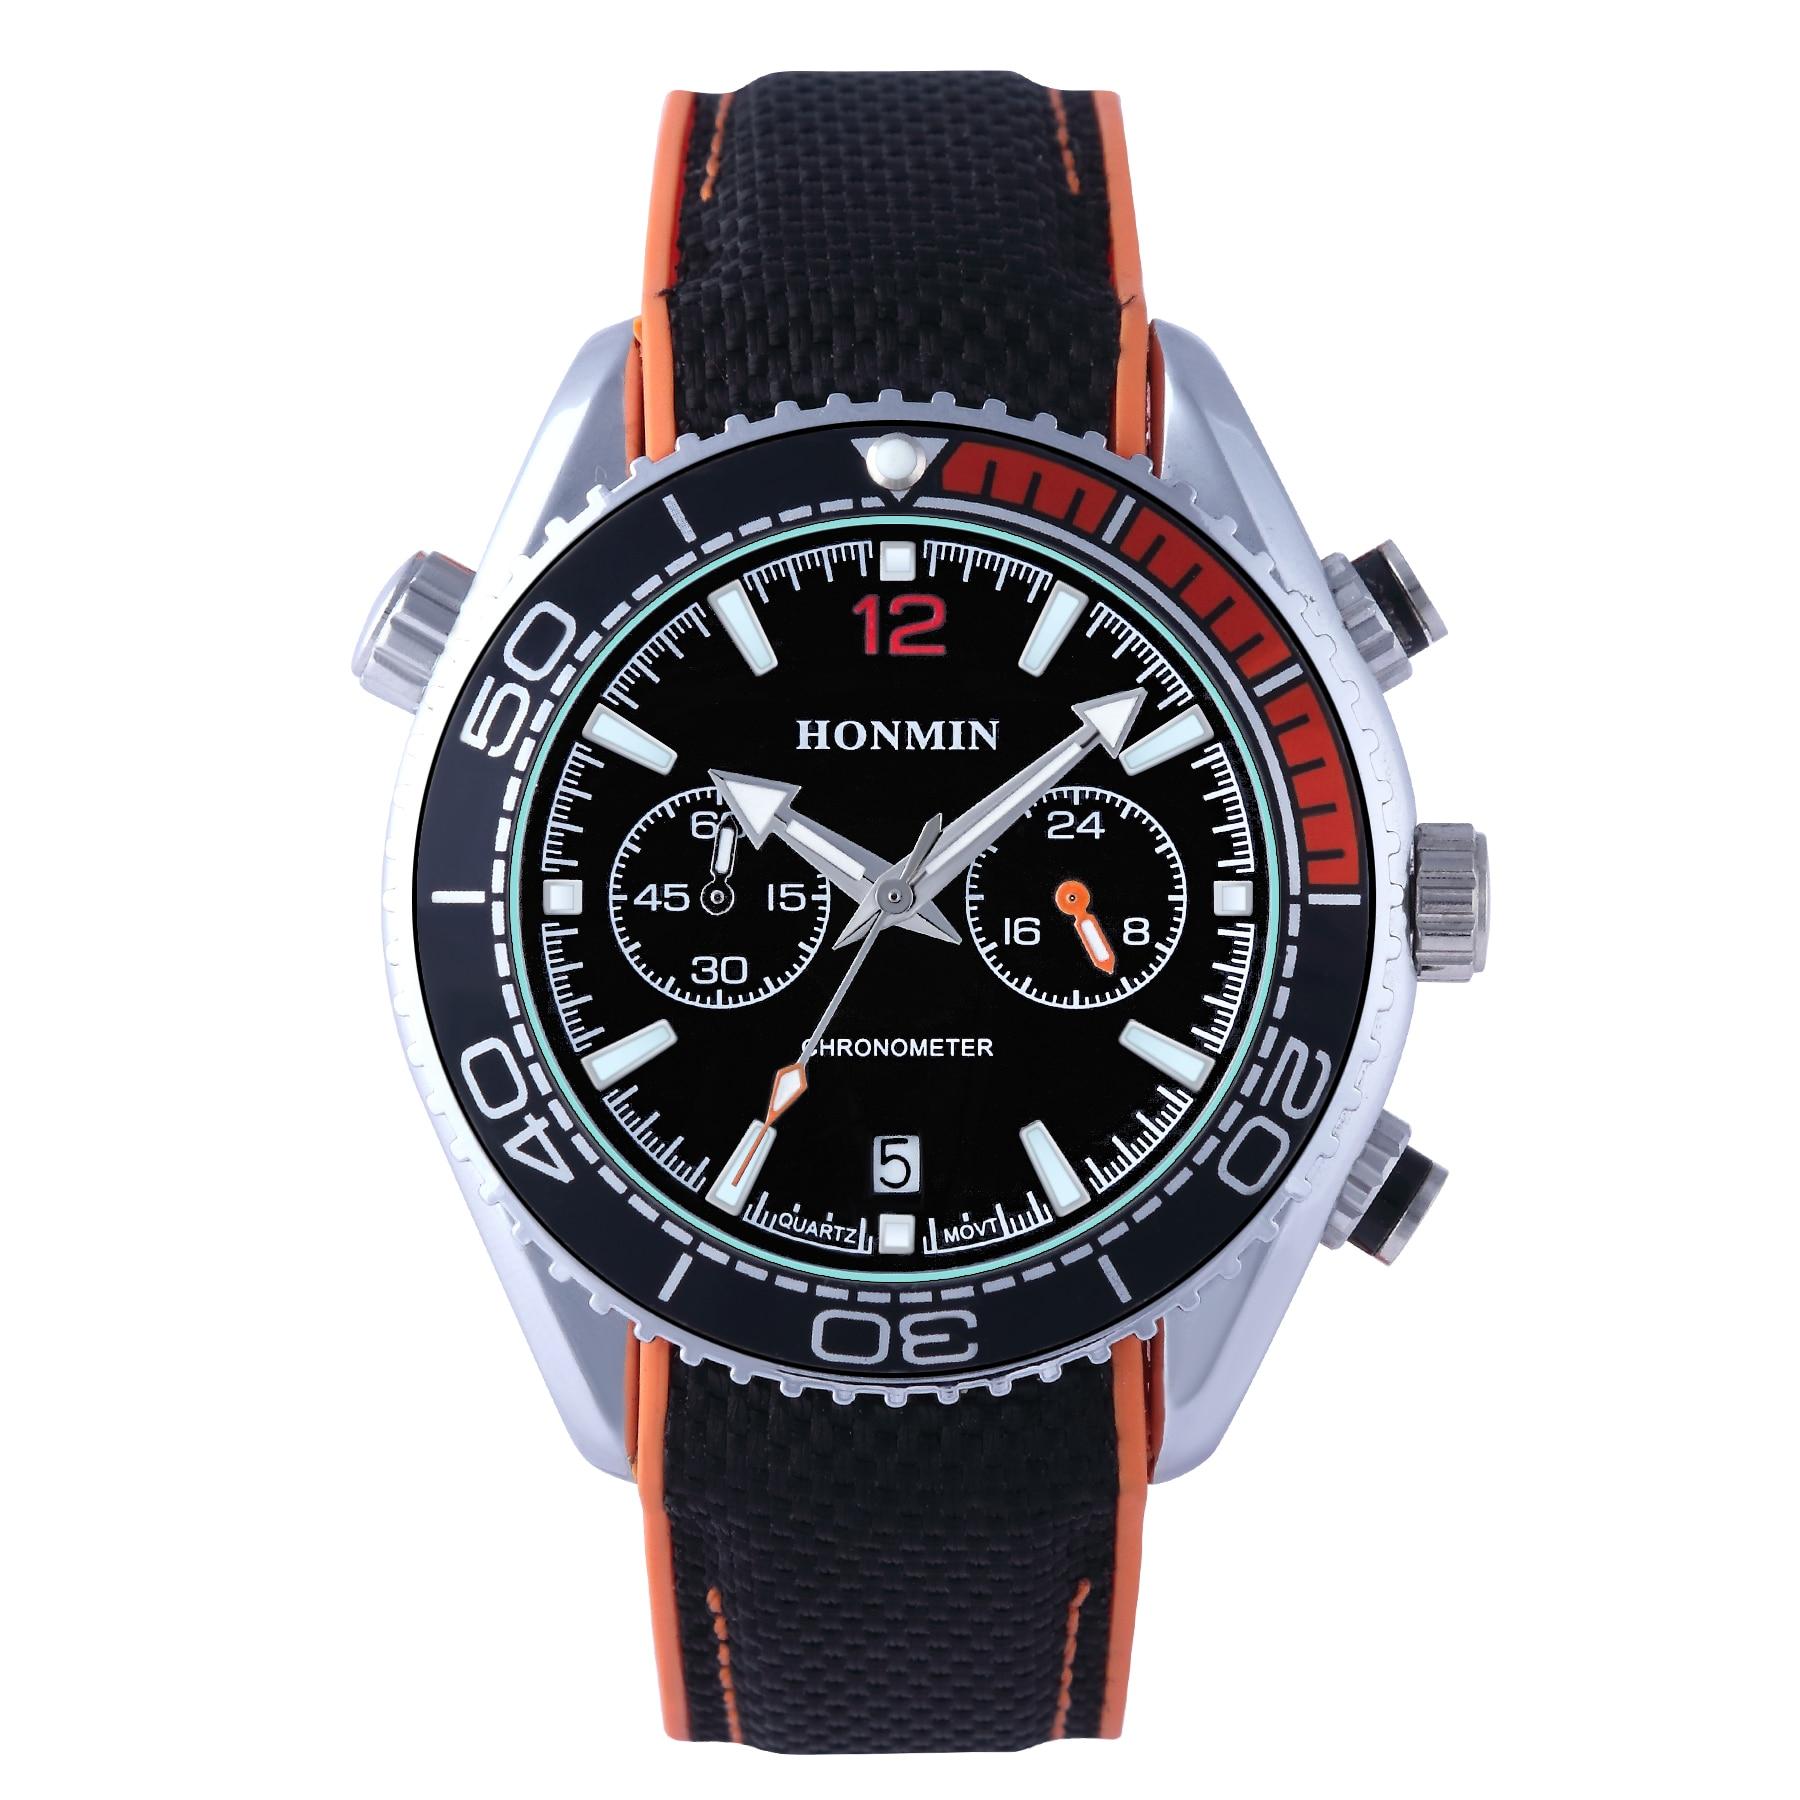 Classic fashion men's business nylon strap watch watches for men men watch mens watches top brand luxury watch fashion